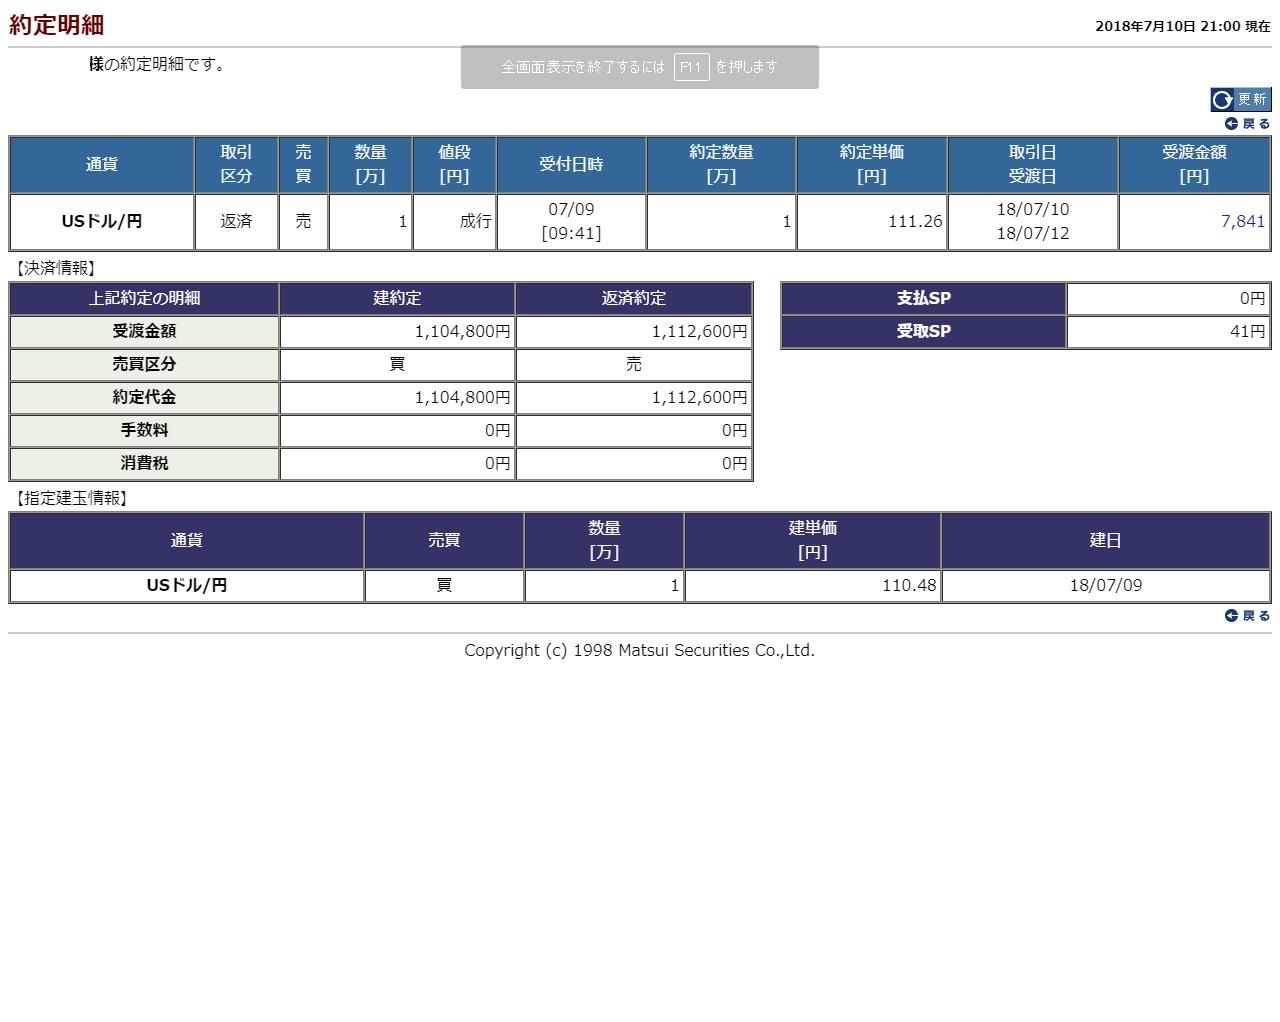 Name Acjpgviews 7775size 418 Kb D 8301